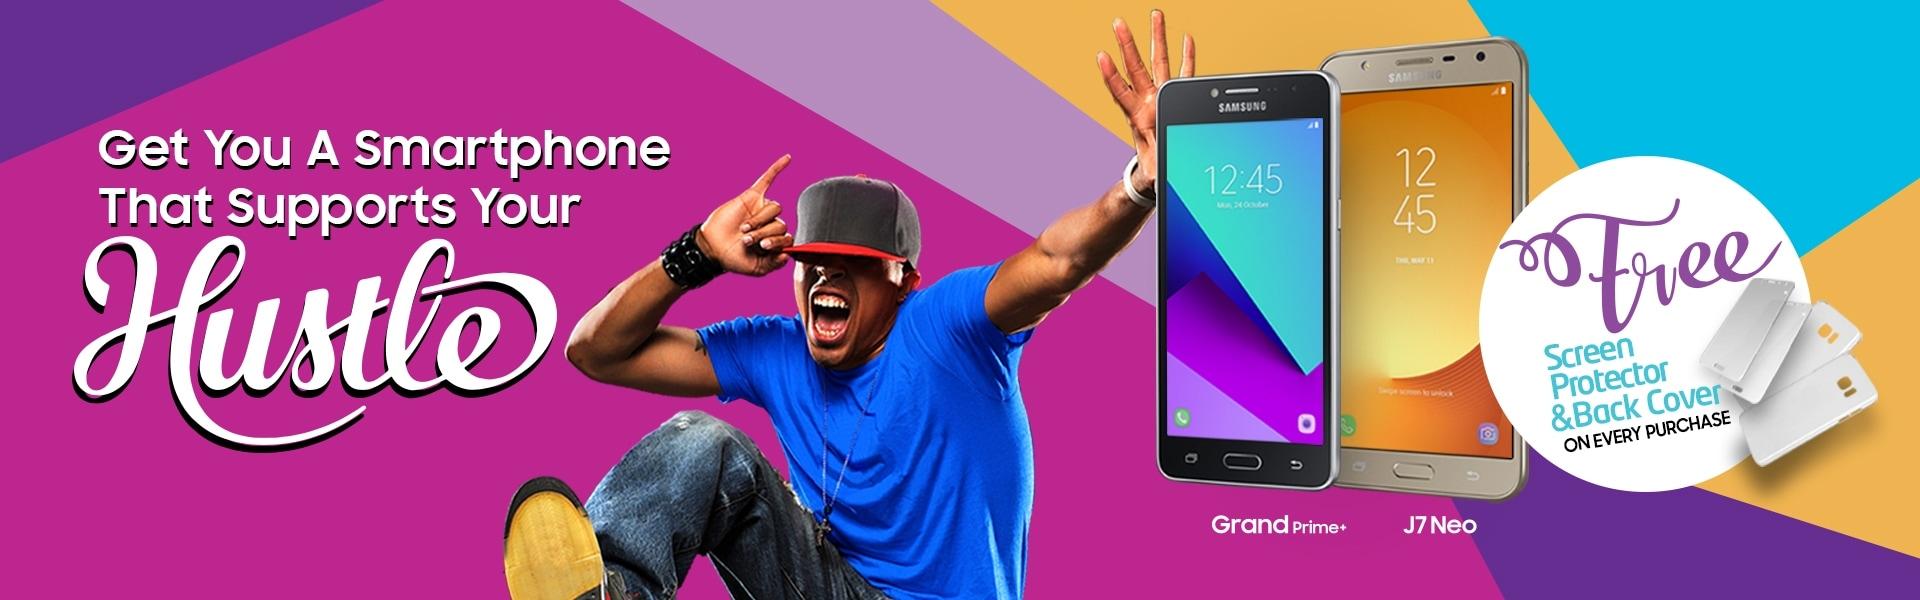 Samsung Galaxy Grand Prime Plus and J7 Neo Promo | Samsung AFRICA_EN